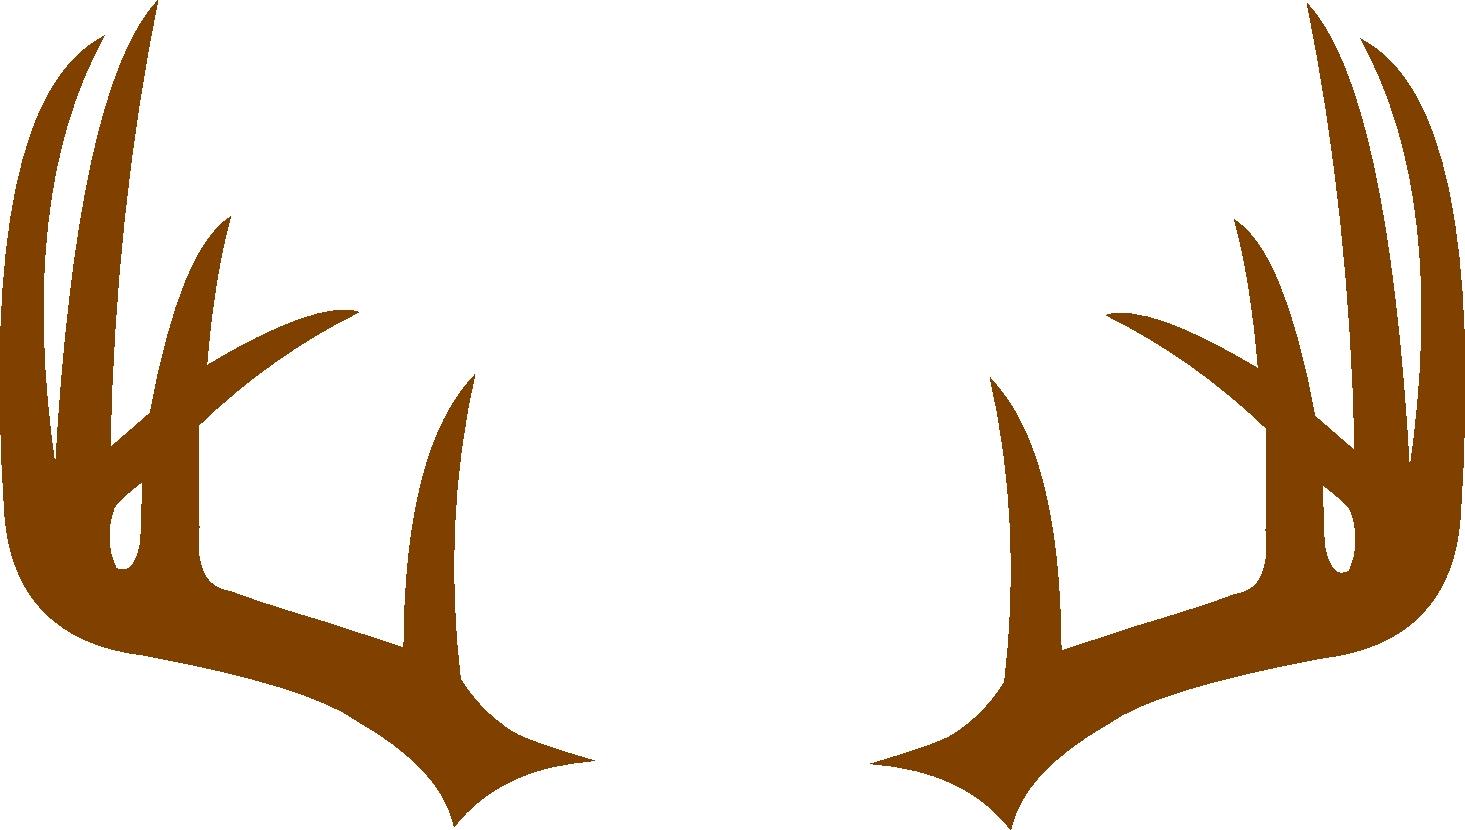 Deer monogram frame svg. Antler clipart bow